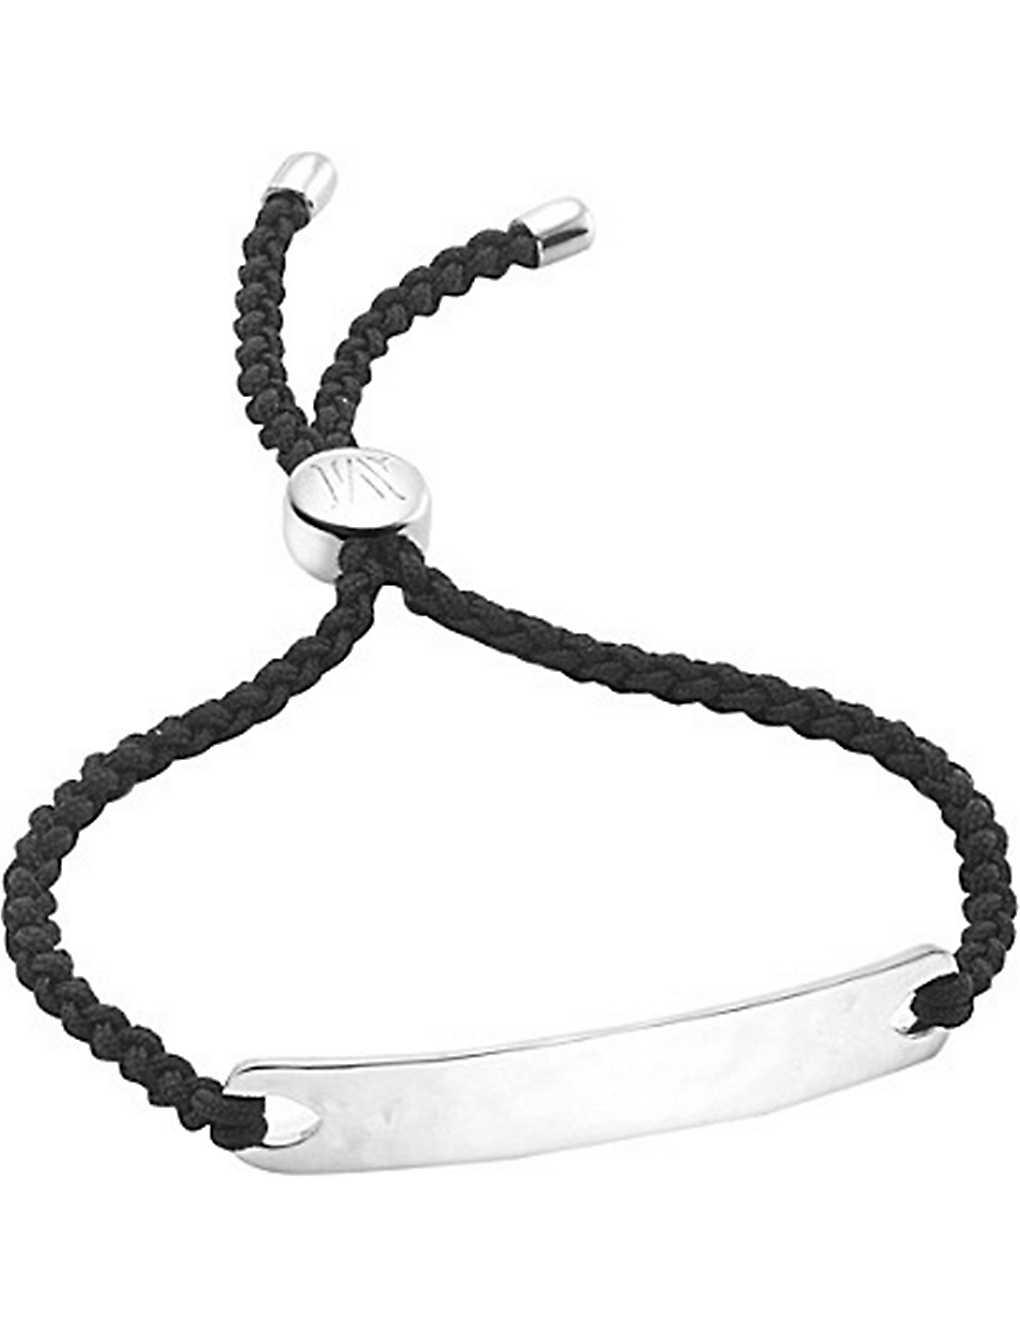 Havana Friendship Bracelet- Black, Gold Vermeil on Silver Monica Vinader